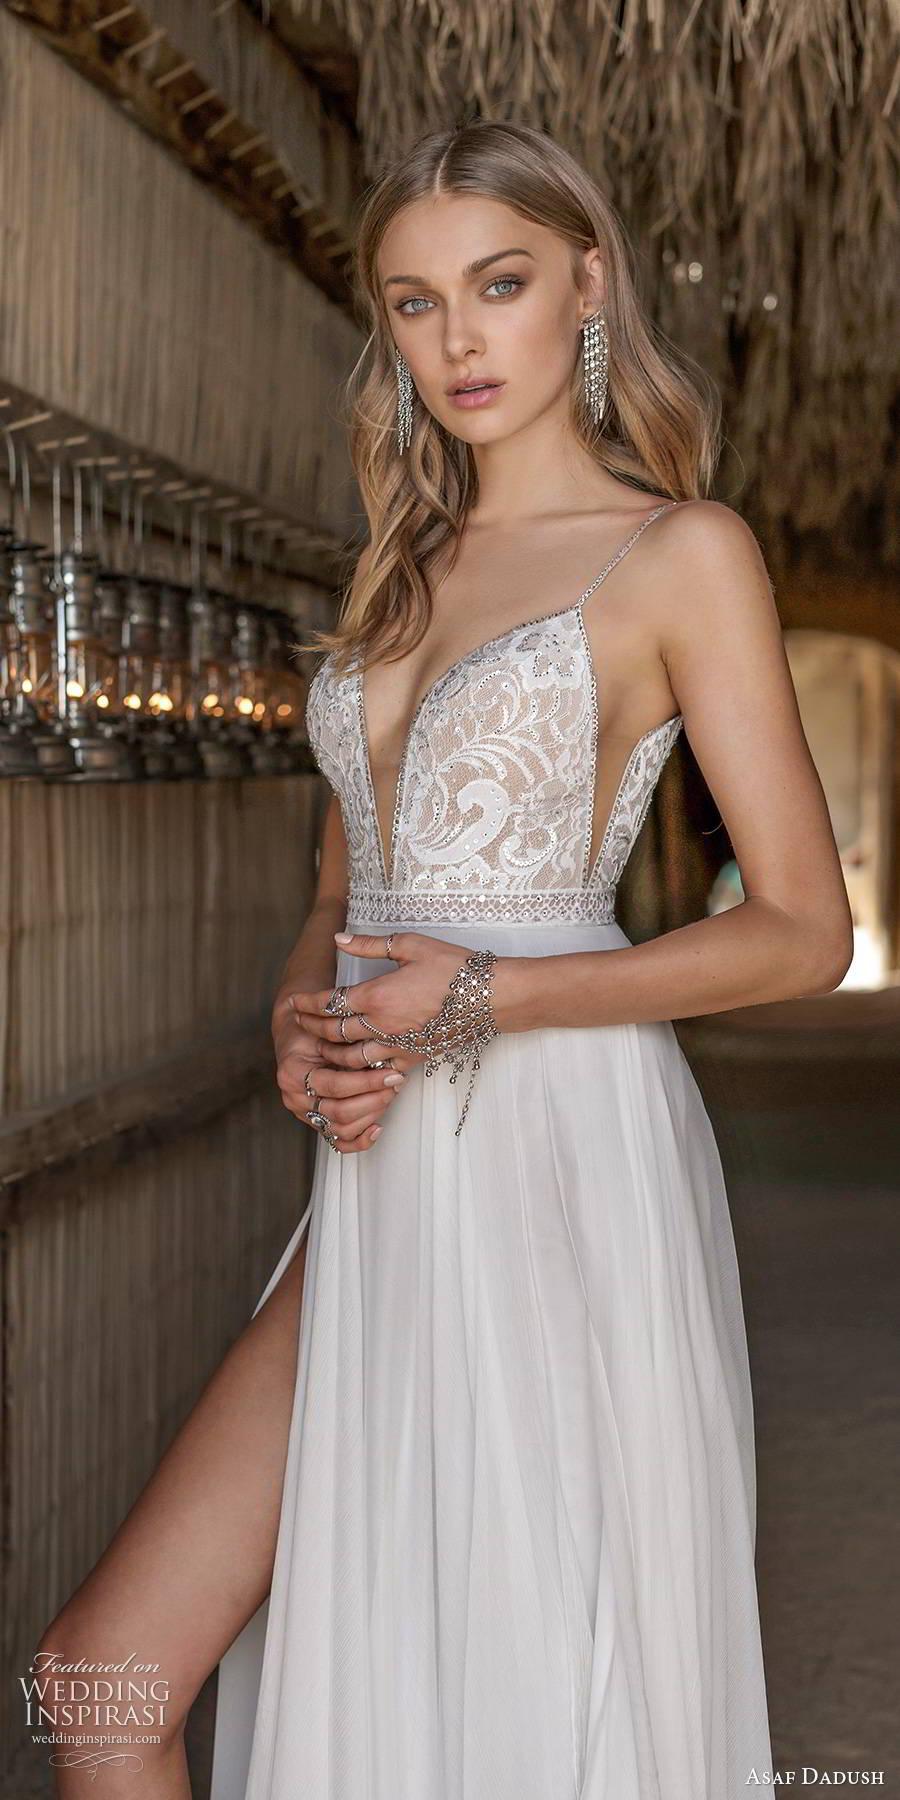 asaf dadush 2019 bridal sleeveless thin straps plunging v neckline embellished bodice slit skirt sexy a line wedding dress (6) zv